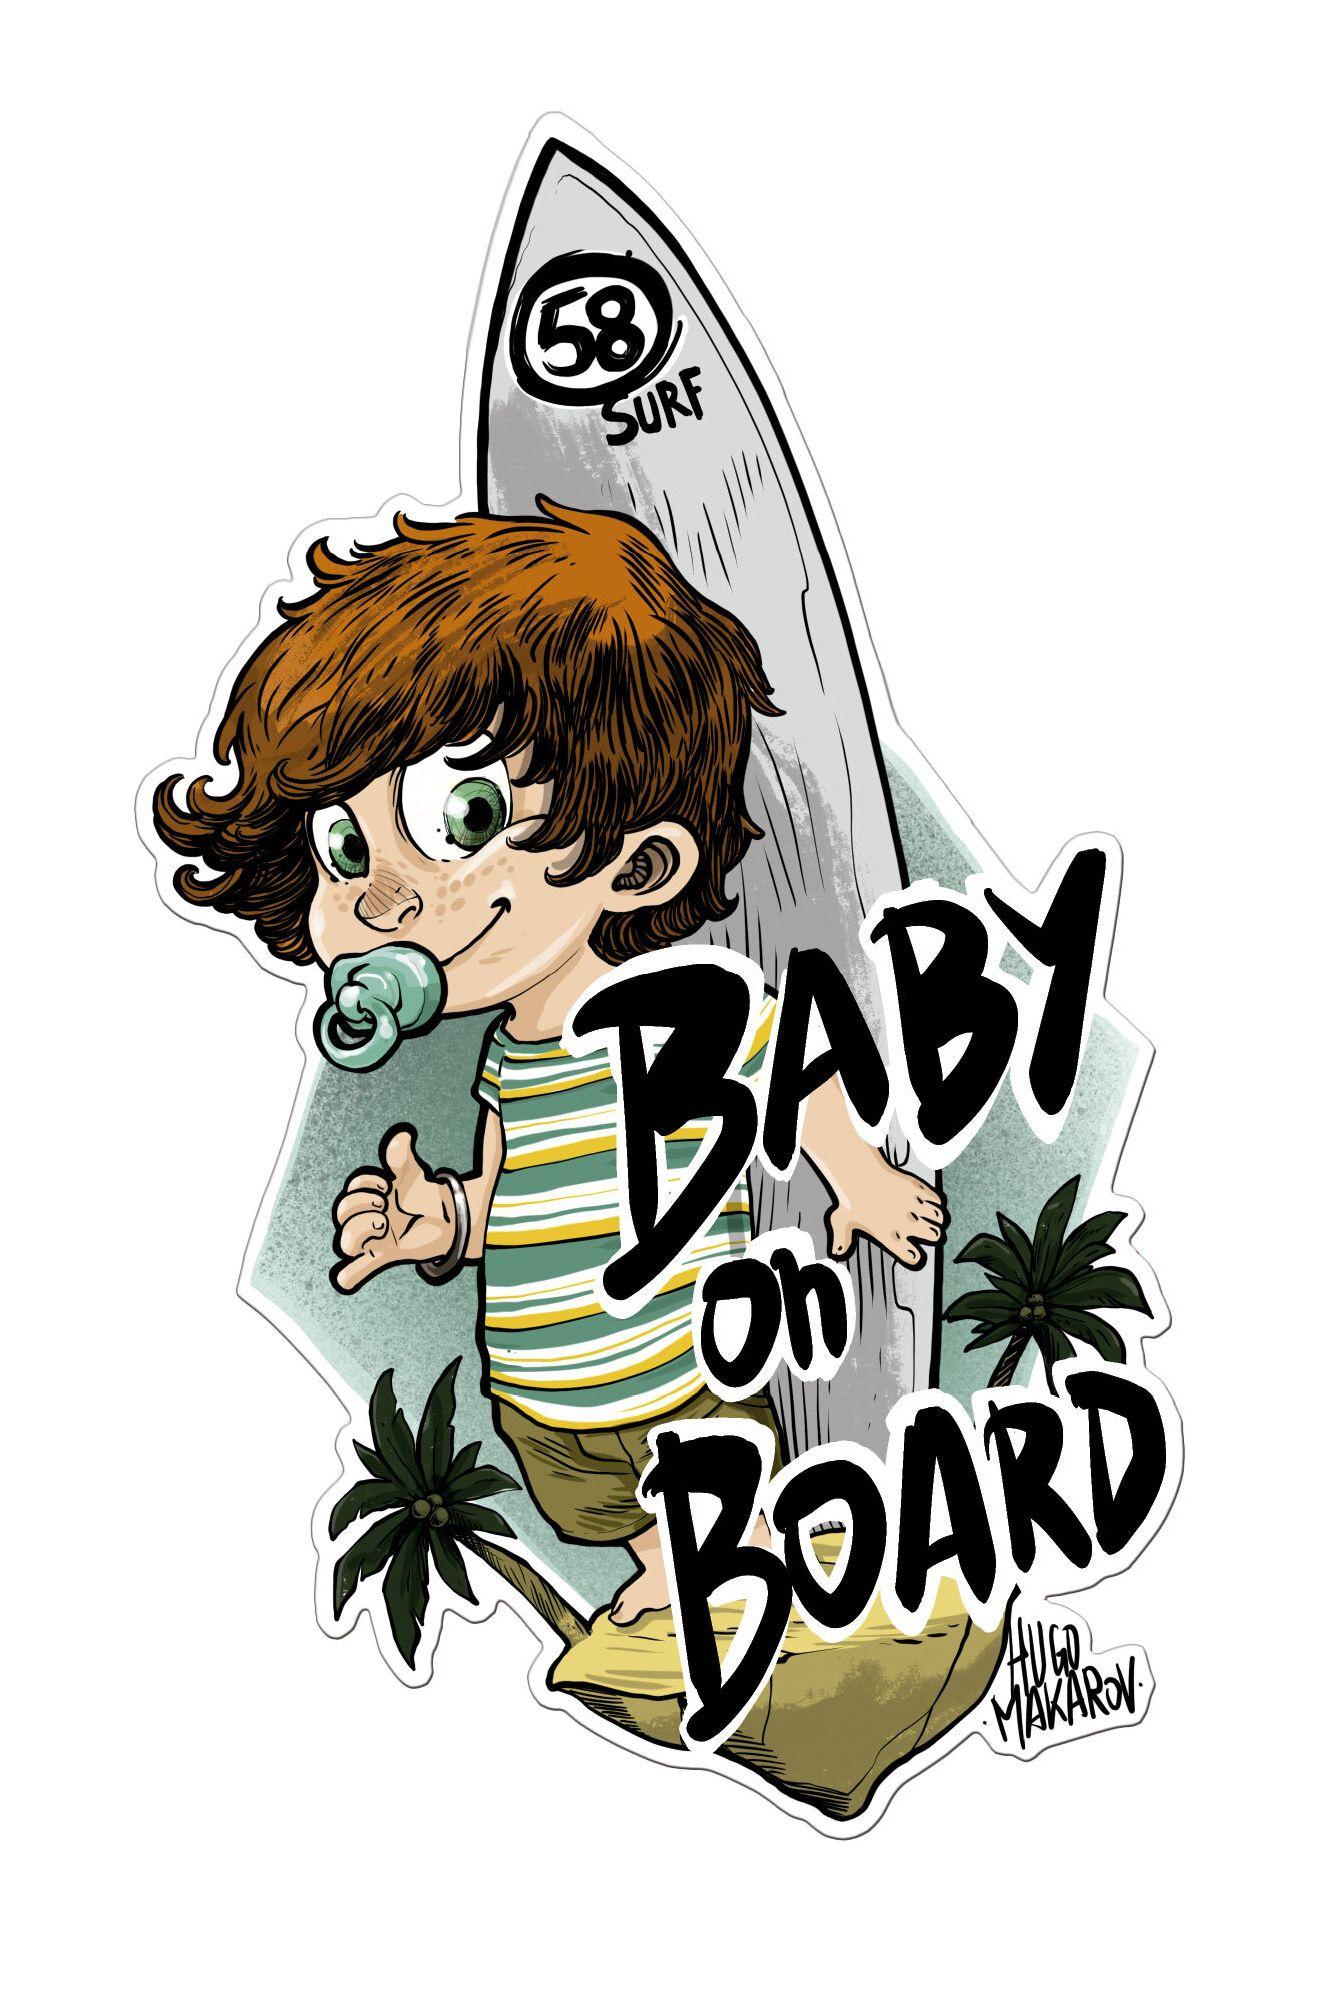 Autocolante 58 Surf BABY ON BOARD BOY Assorted